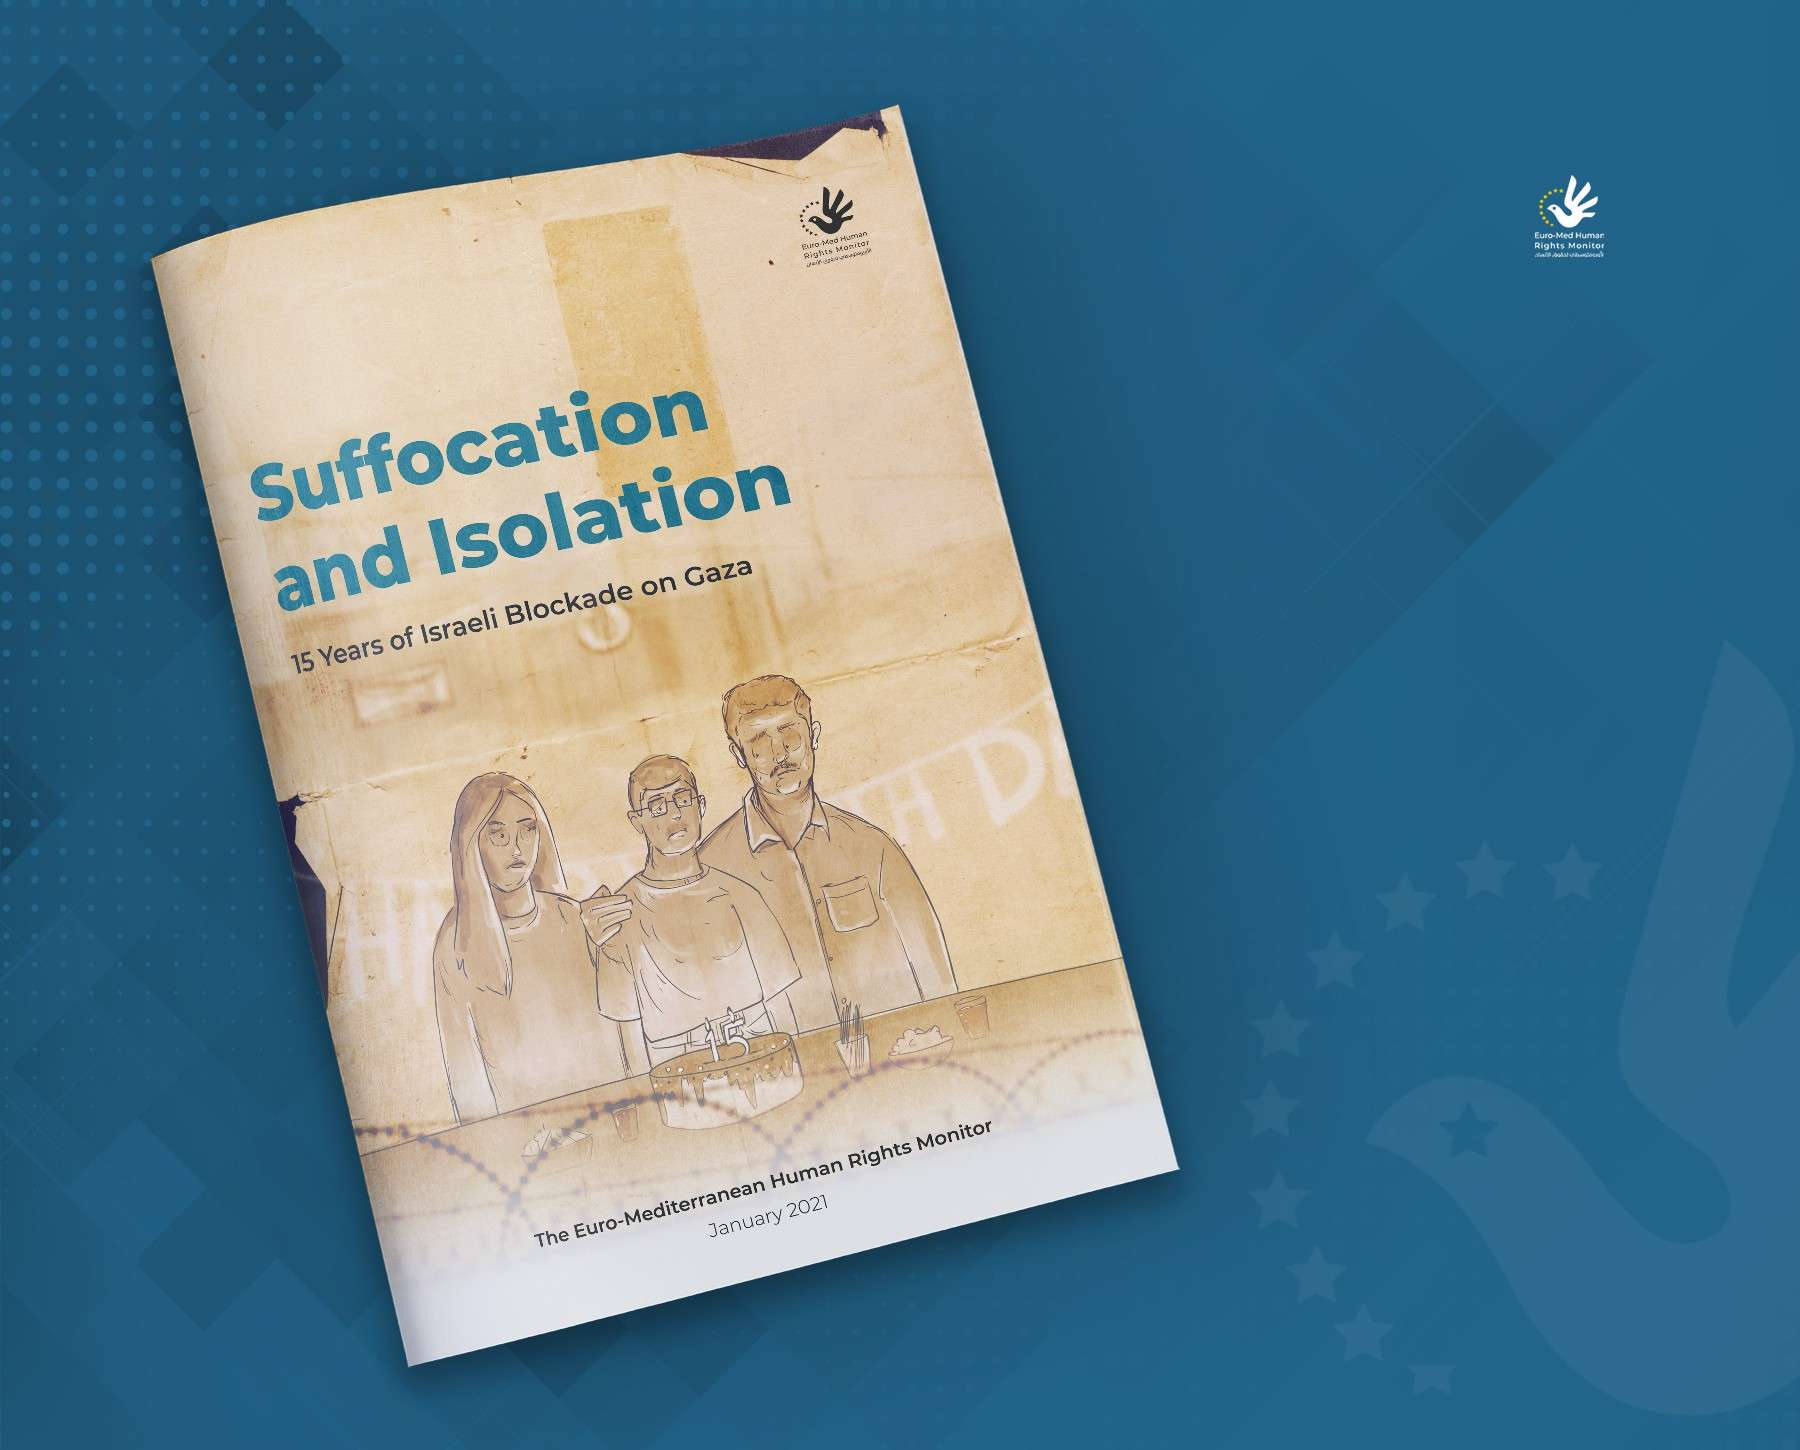 Suffocation and Isolation..15 Years of Israeli Blockade on Gaza